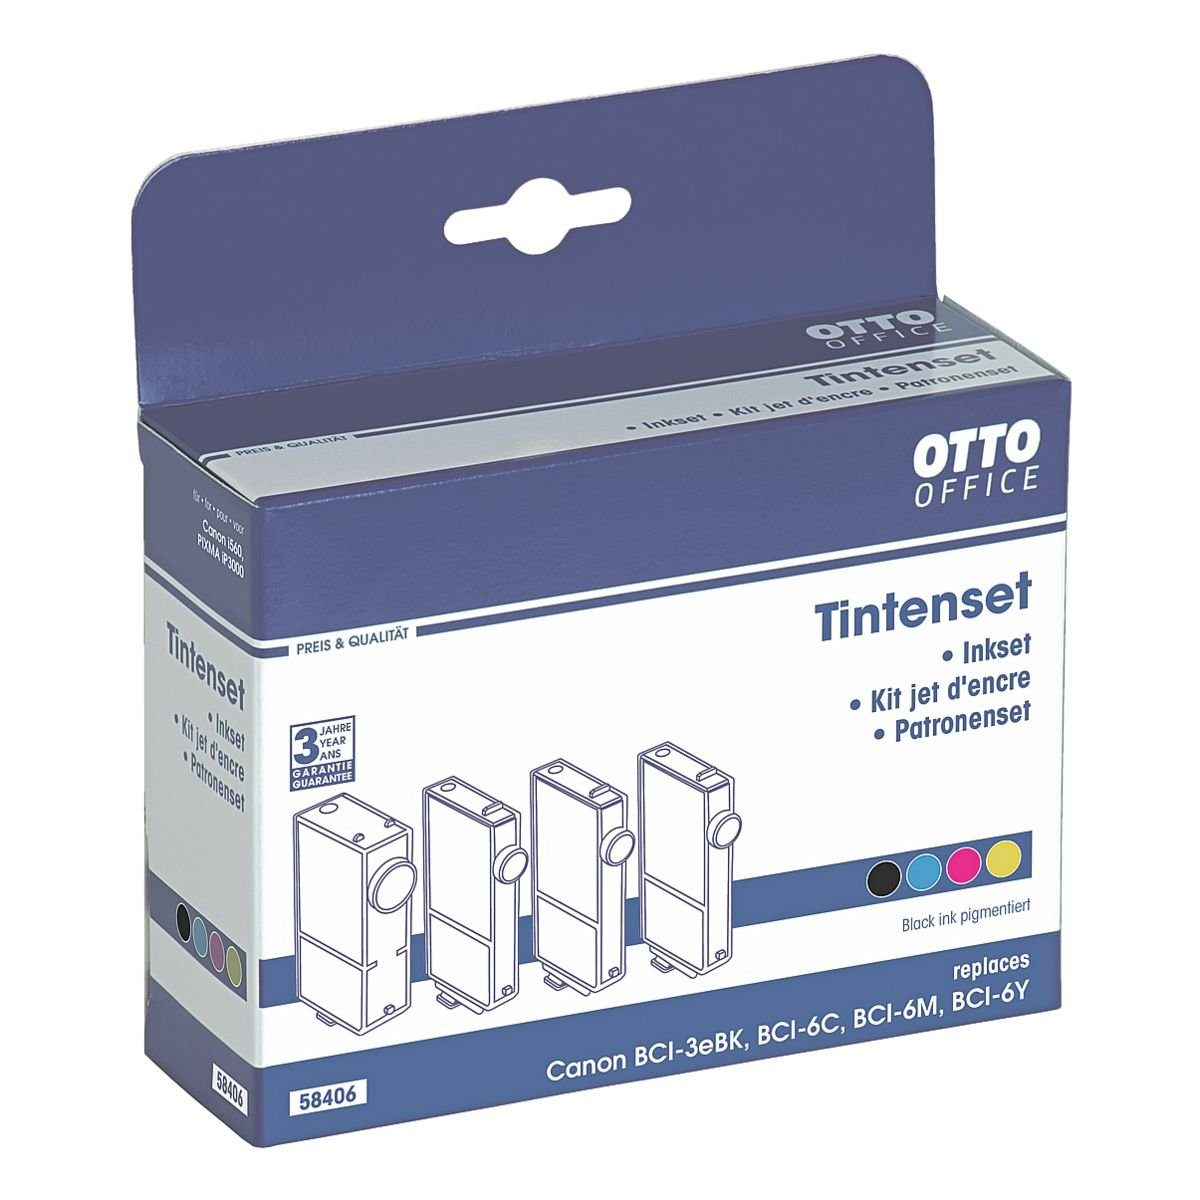 OTTO Office Standard Tintenpatronen-Set ersetzt Canon »BCI-3eBK / BCI-6«